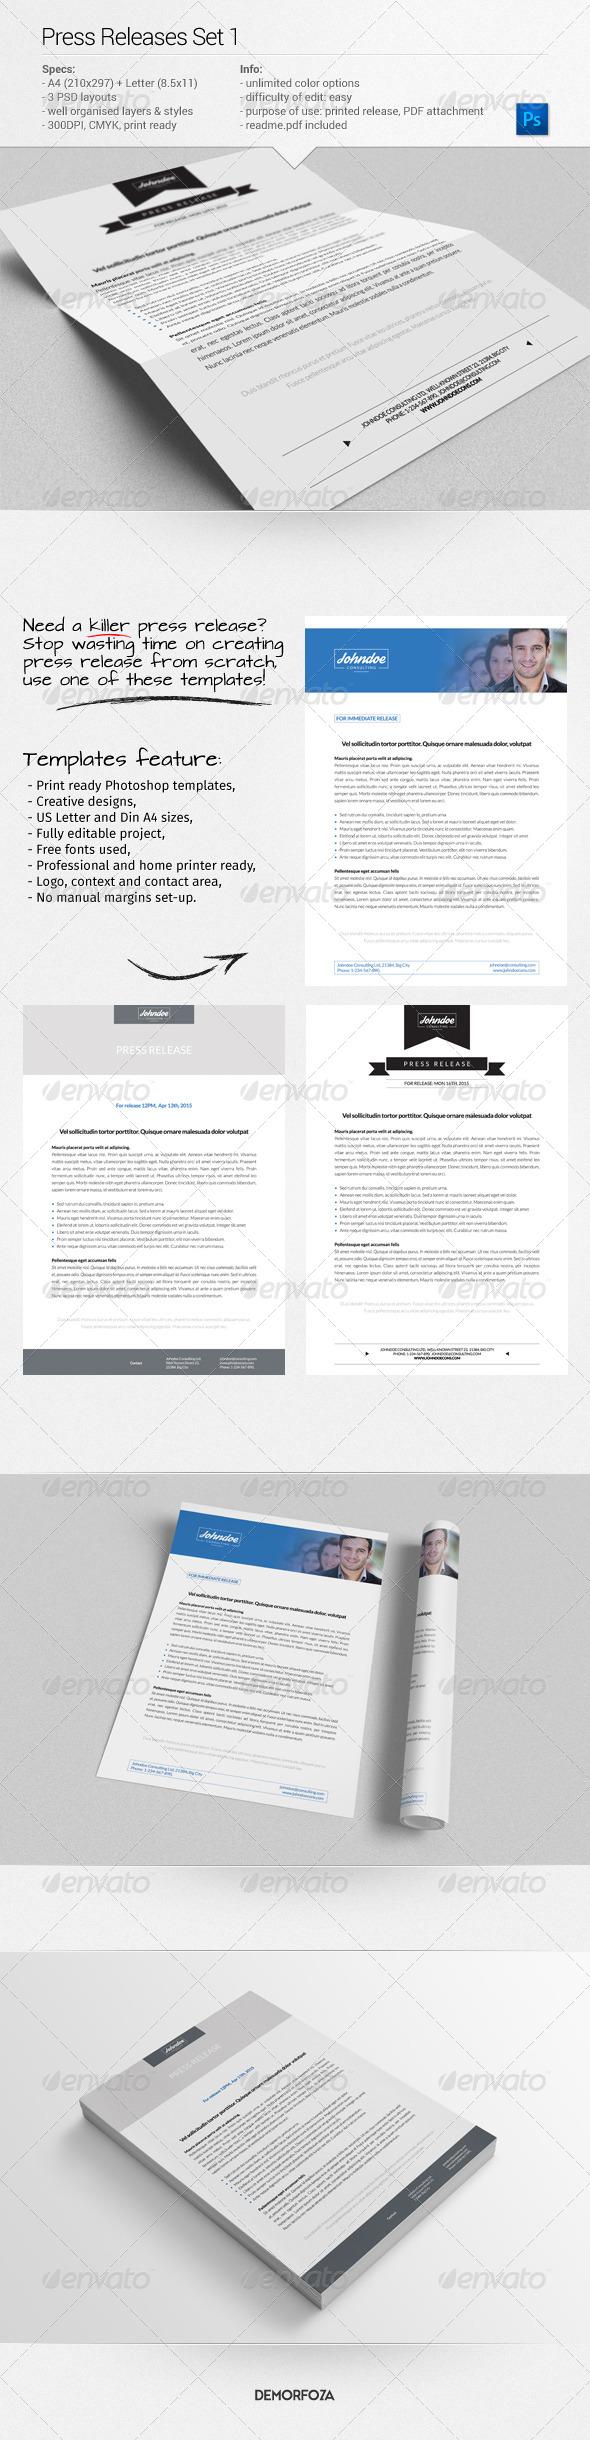 GraphicRiver Press Releases Set 1 8075946